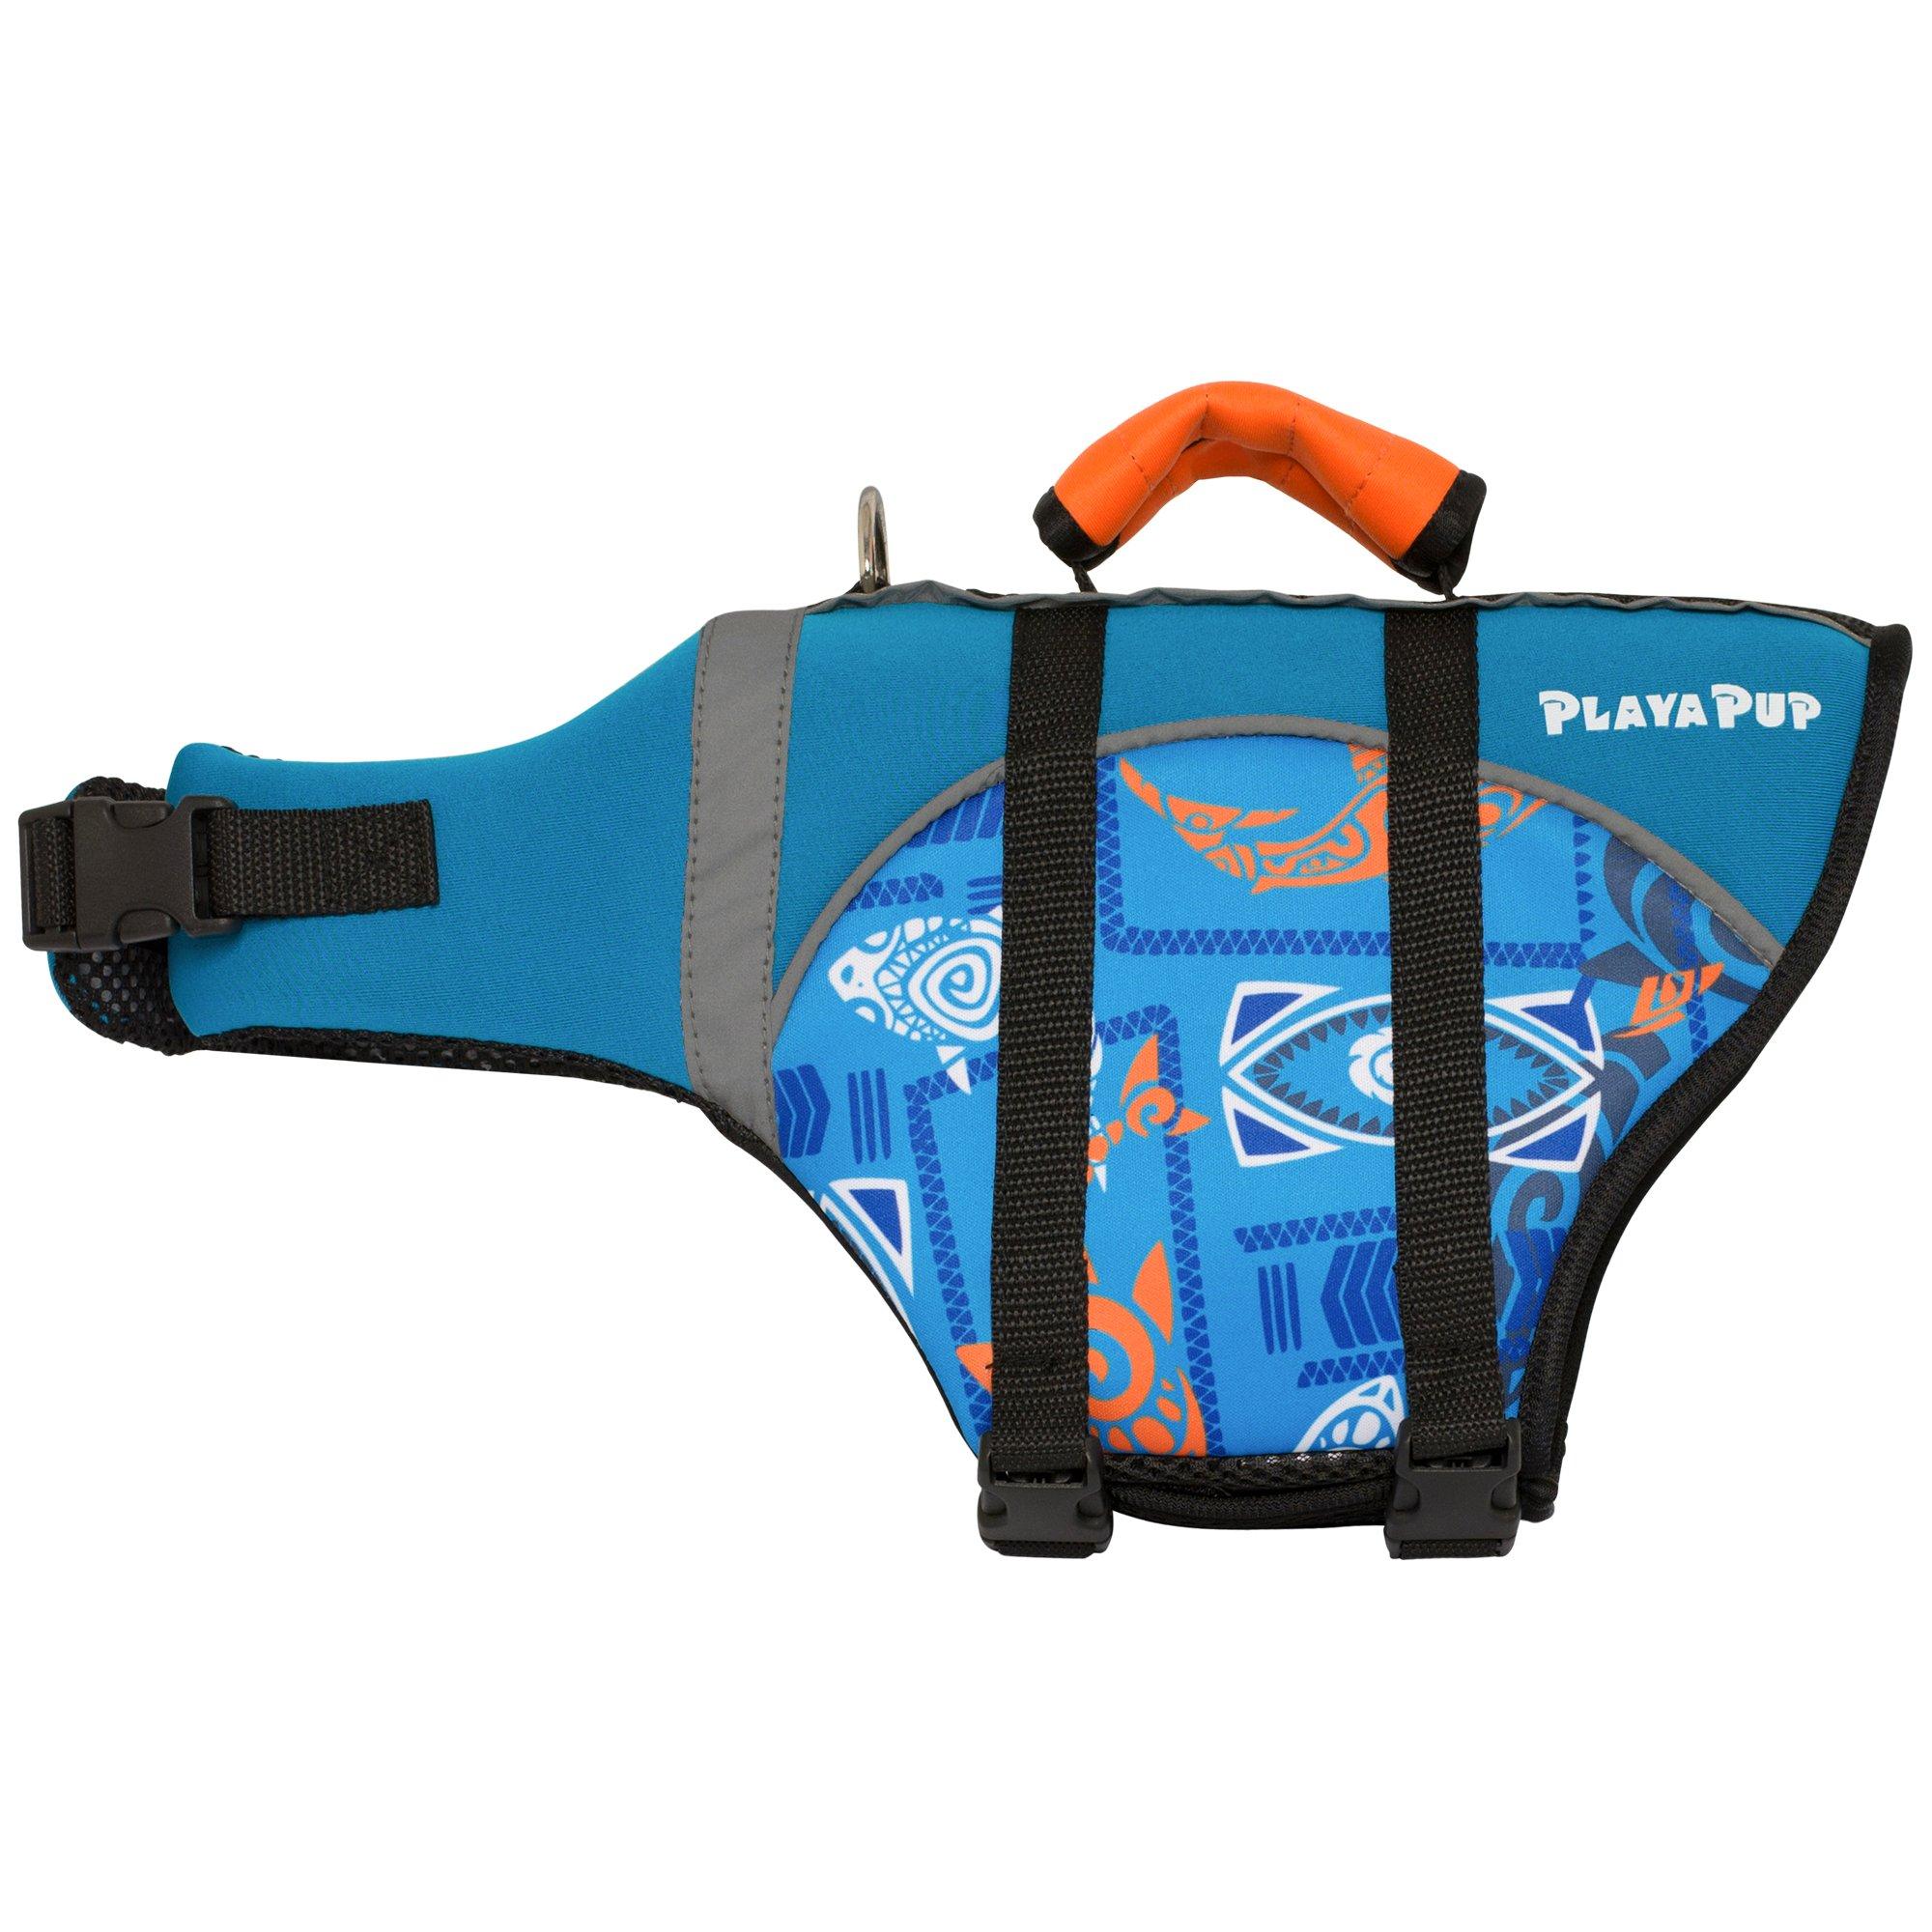 Image of Playa Pup Pet Flotation Vest Blue Shark, X-Large, Blue / Orange